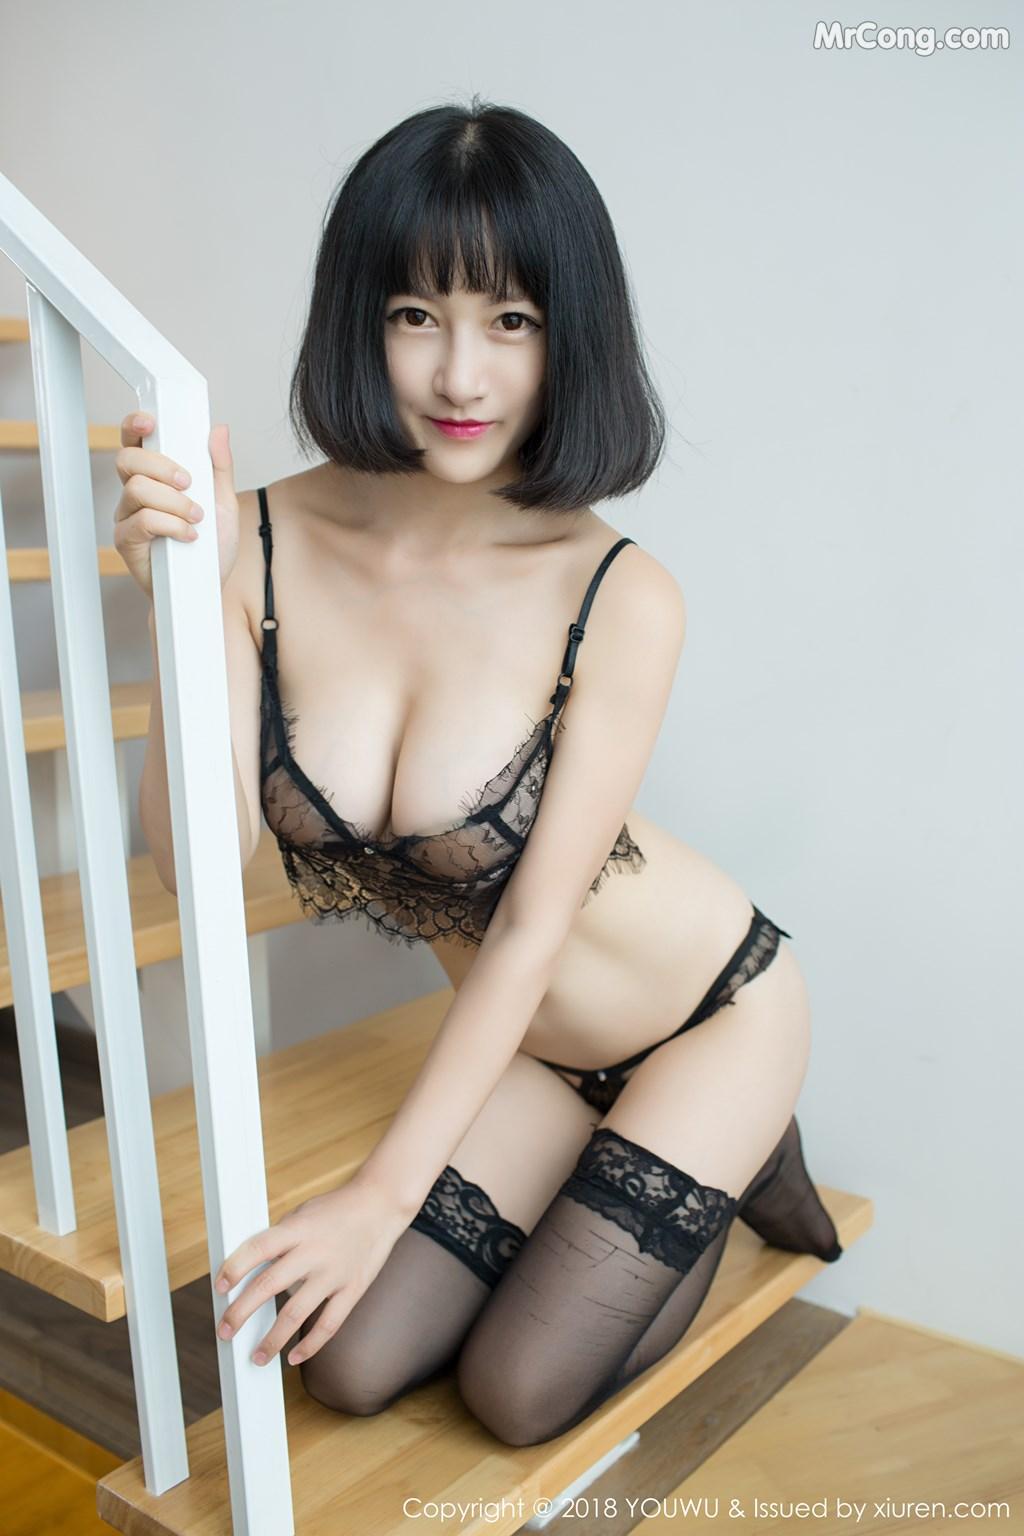 Image YouWu-Vol.114-MrCong.com-007 in post YouWu Vol.114: Người mẫu Xiao Tan Ge (小探戈-) (45 ảnh)